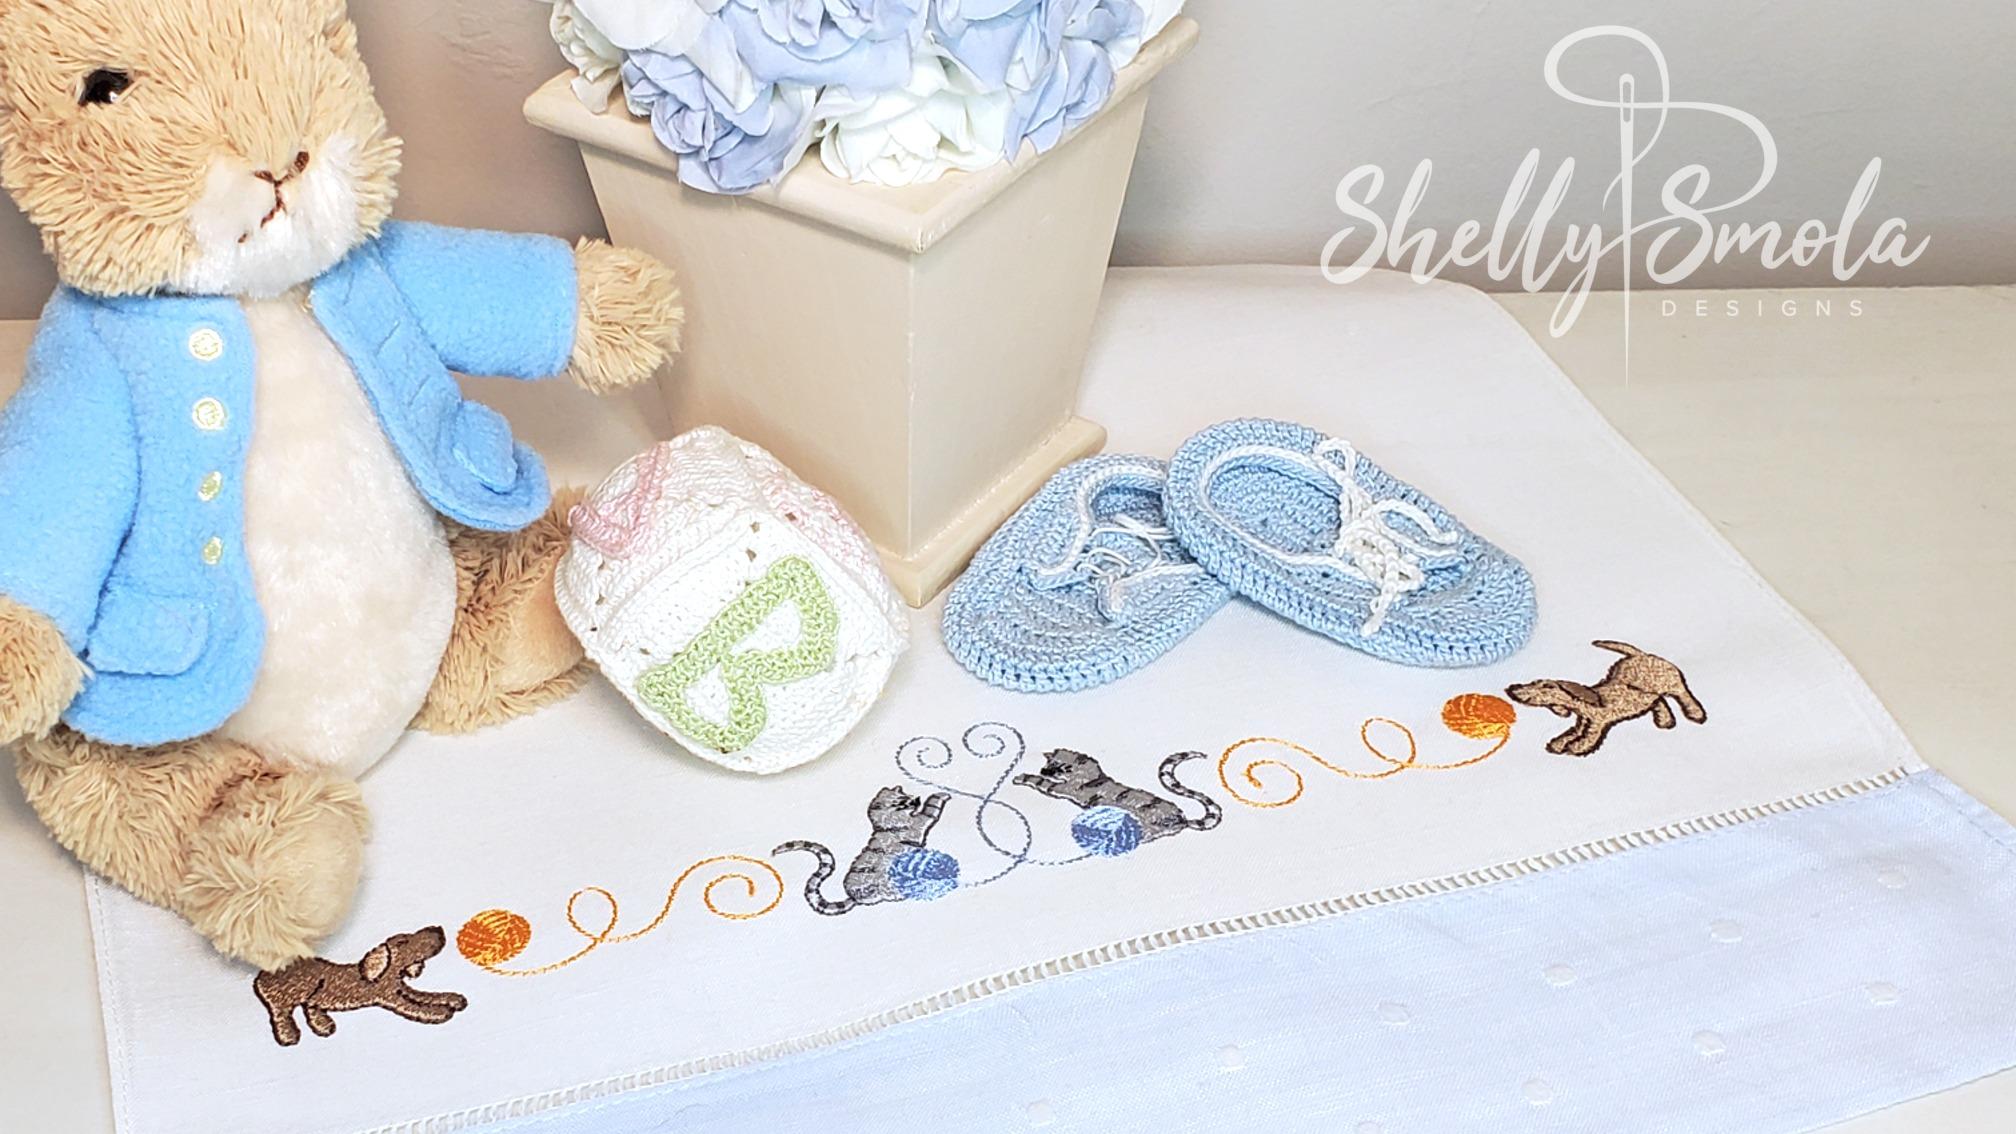 Playful Threads Border Tea Towel by Shelly Smola